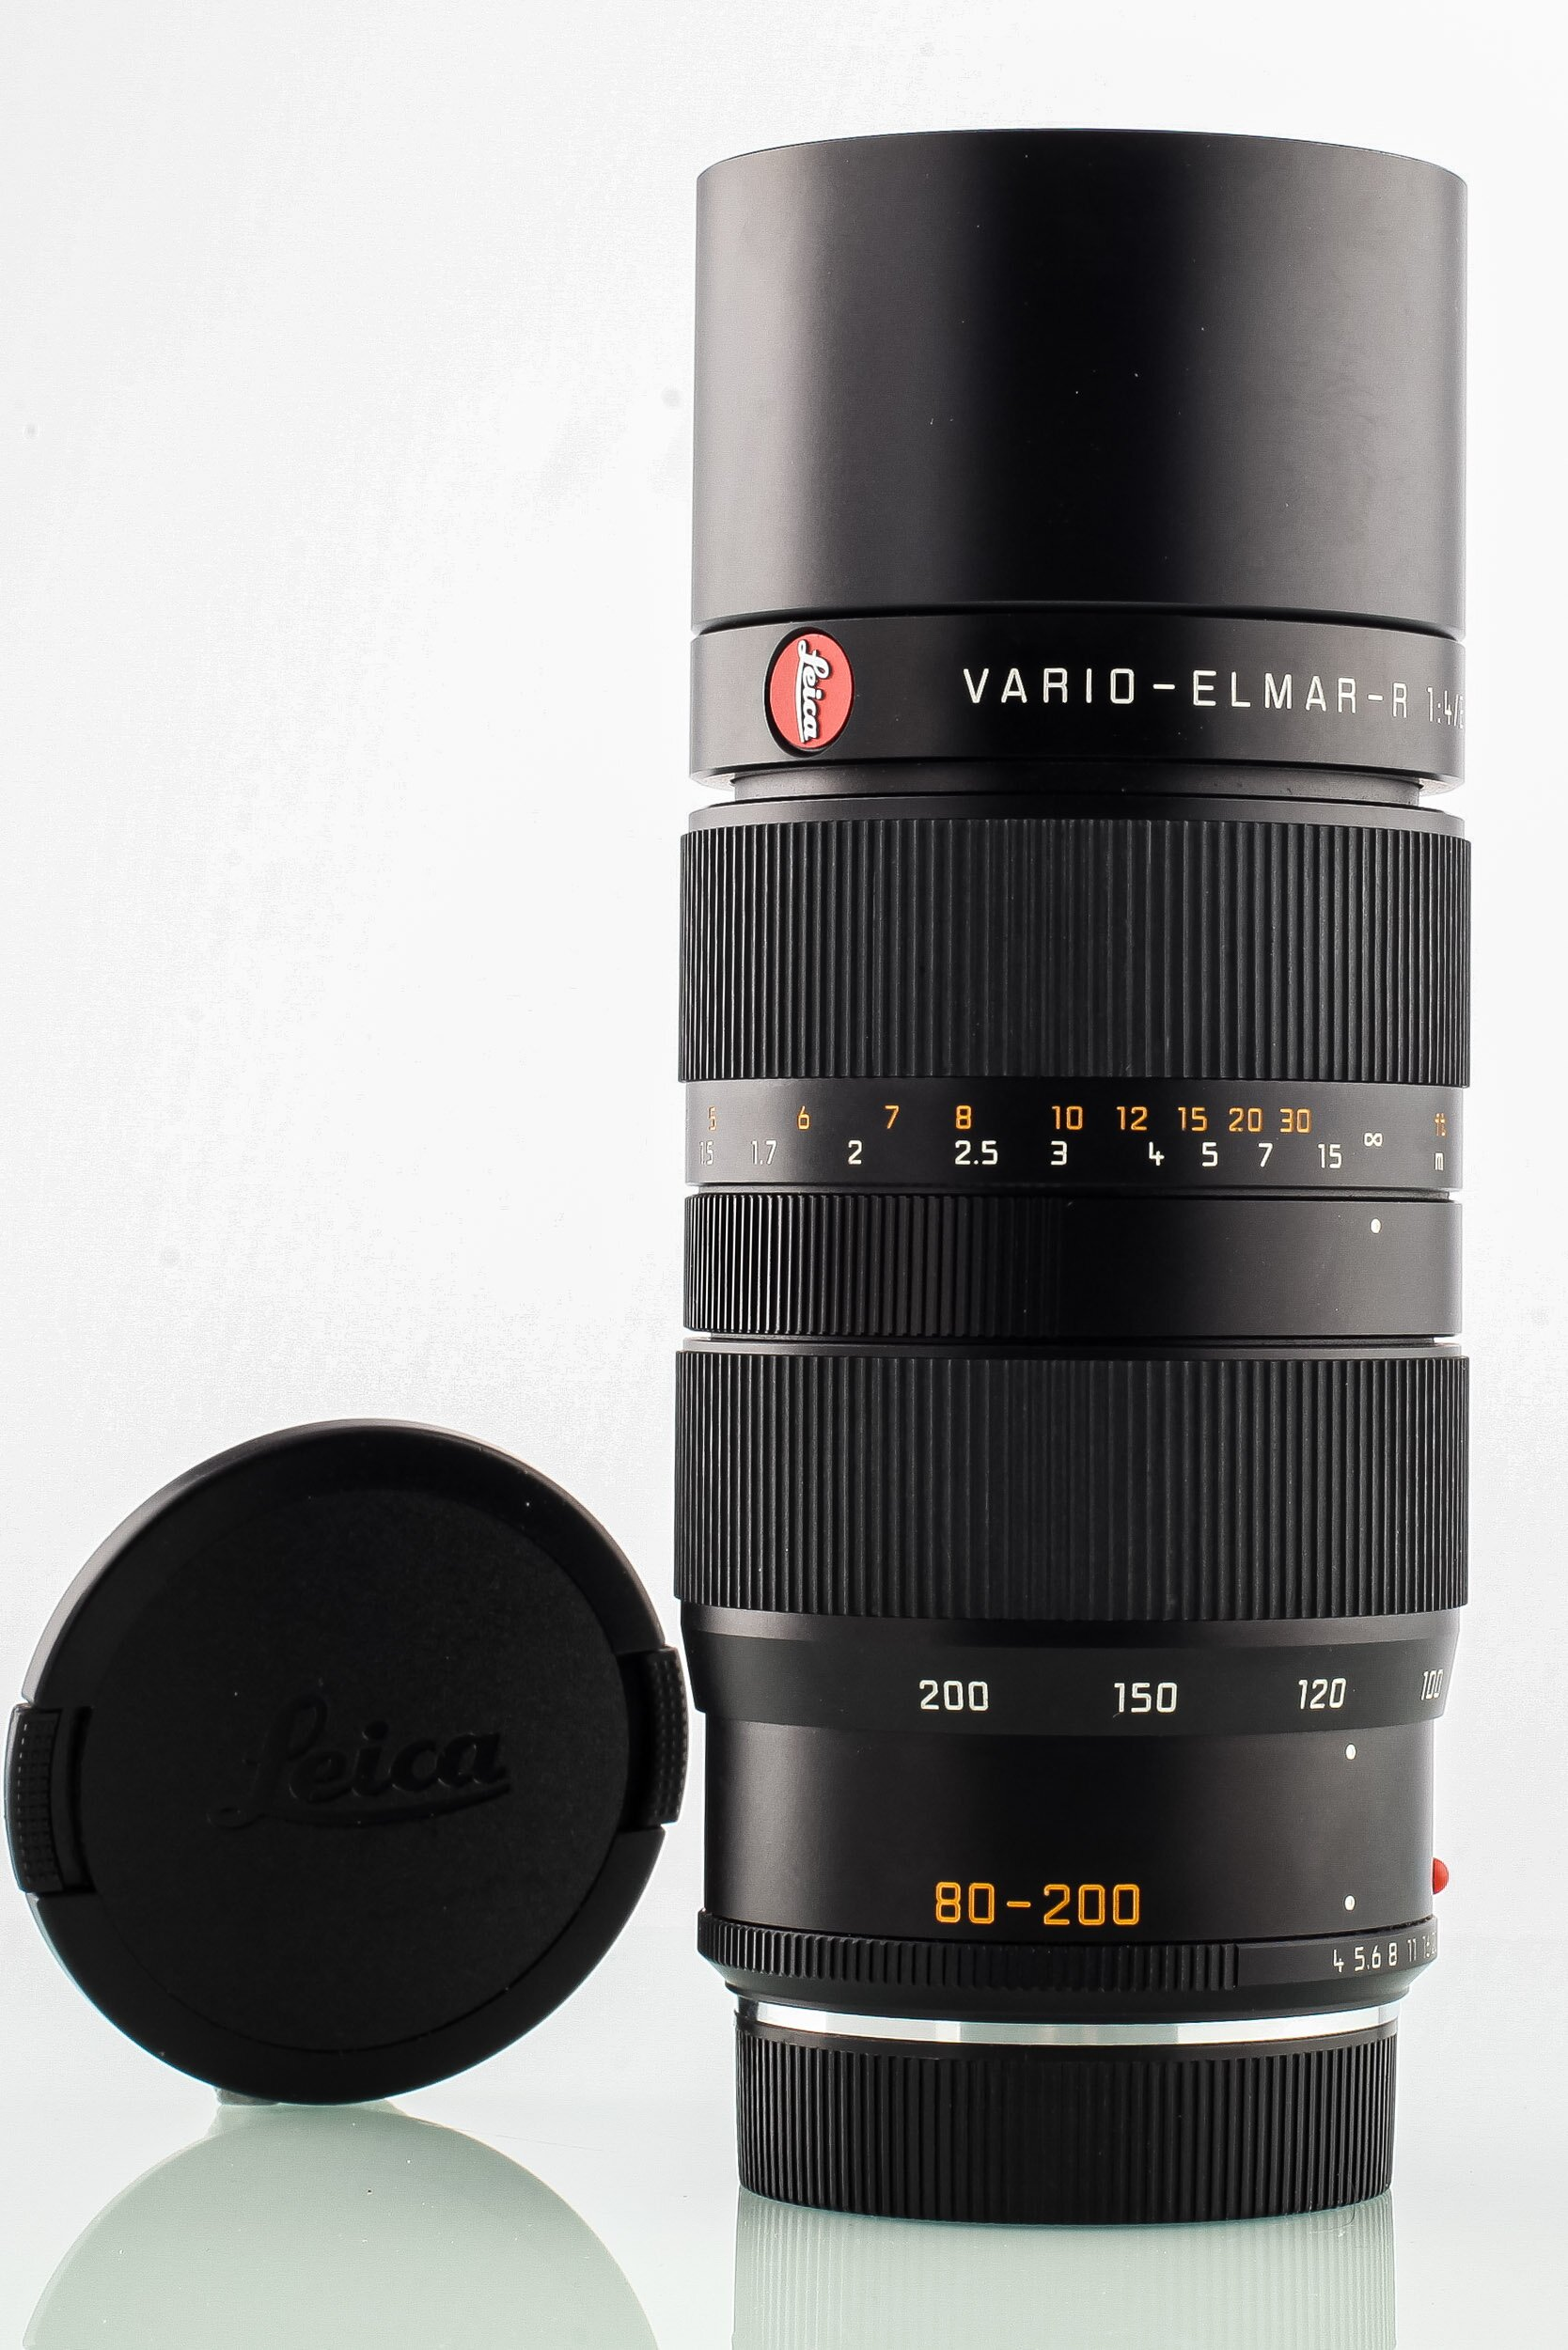 Leica Vario-Elmar-R 4/80-200mm E60 ROM